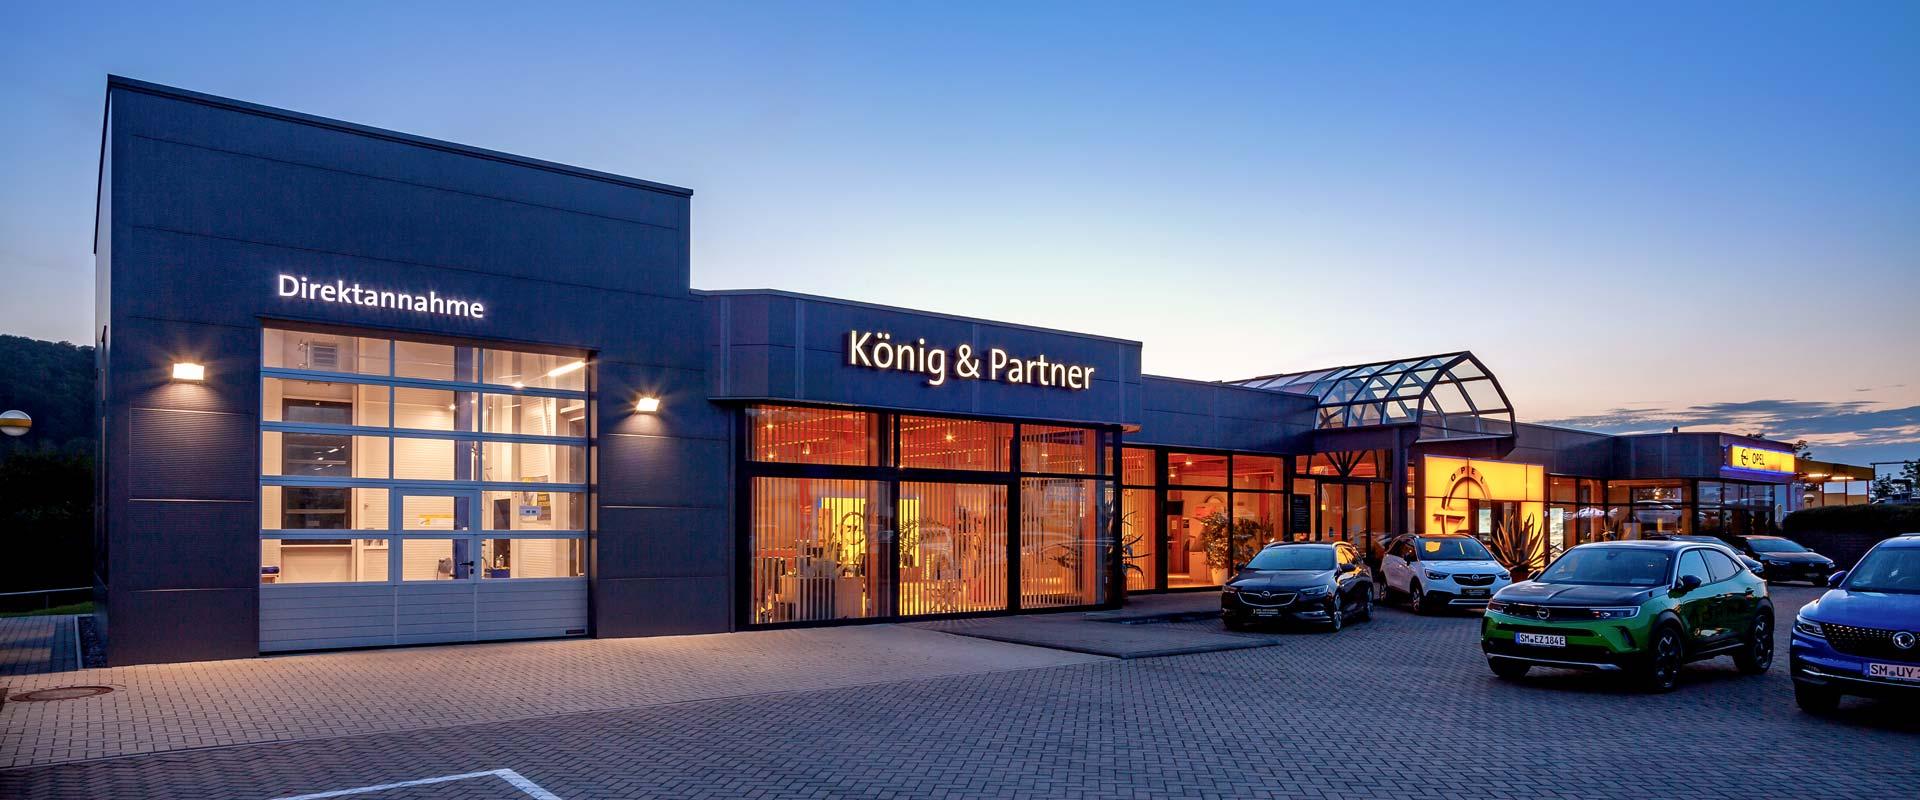 Autohaus König & Partner in Meiningen